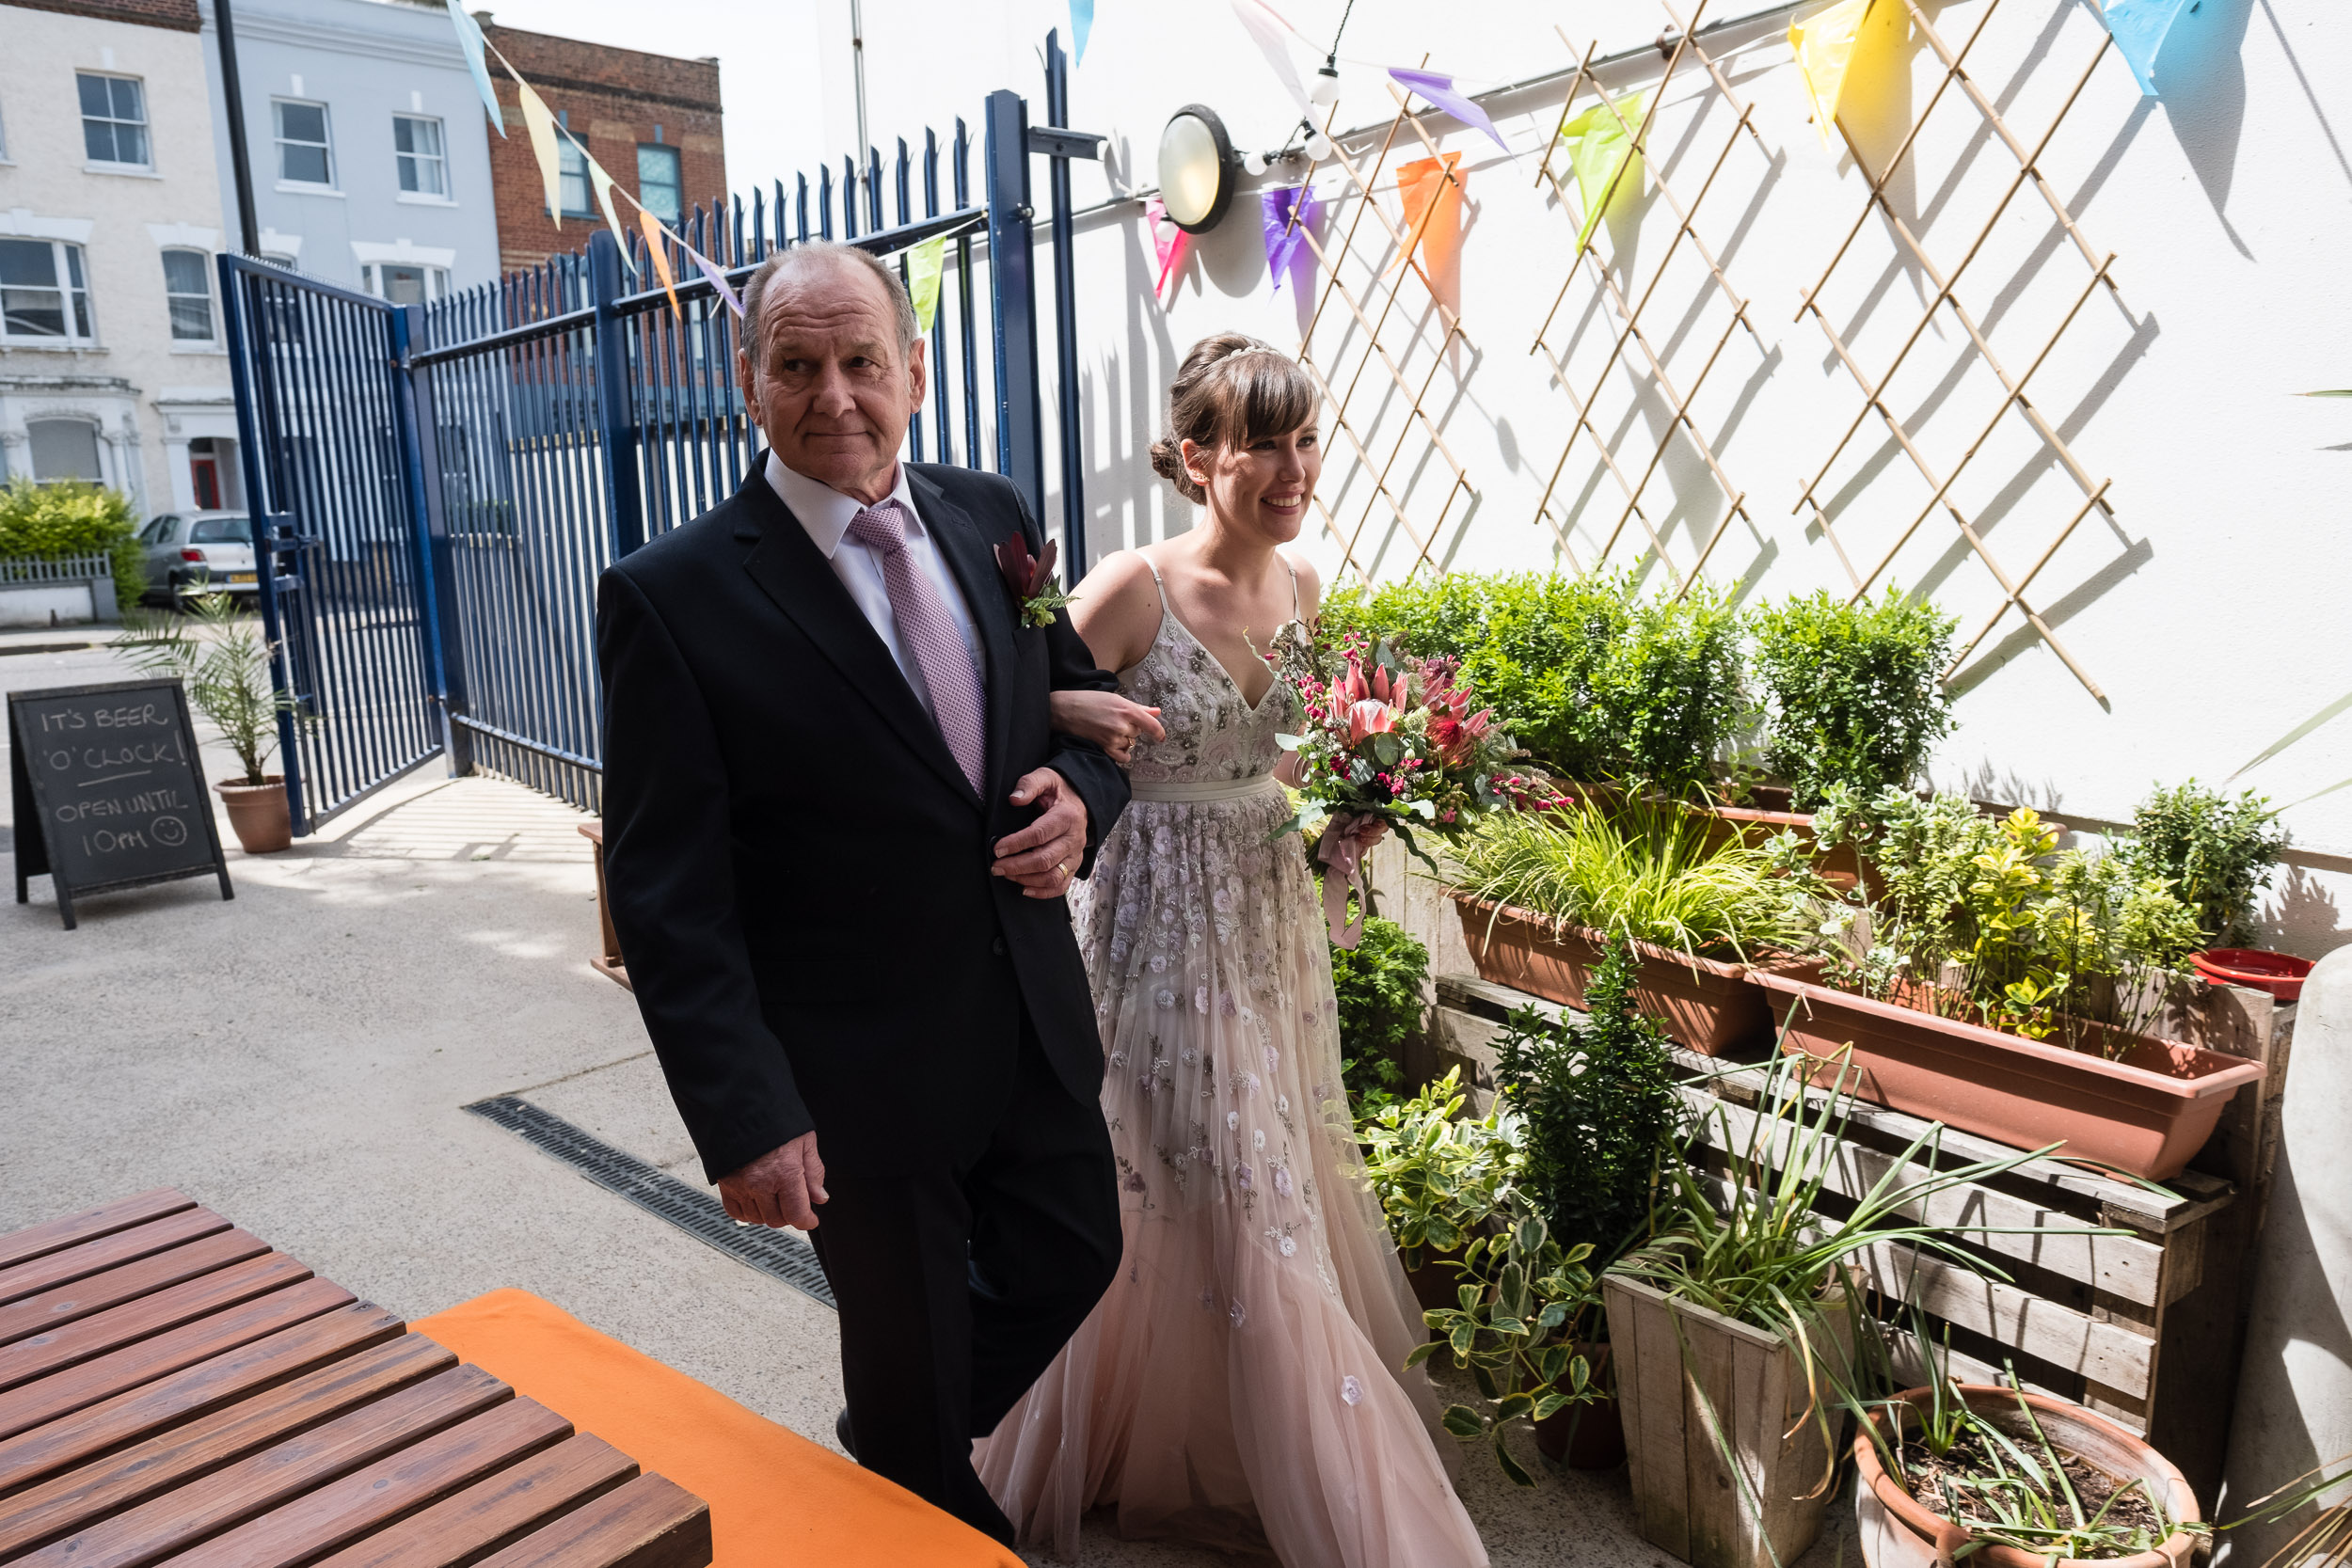 brockwell-lido-brixton-herne-hill-wedding-041.jpg